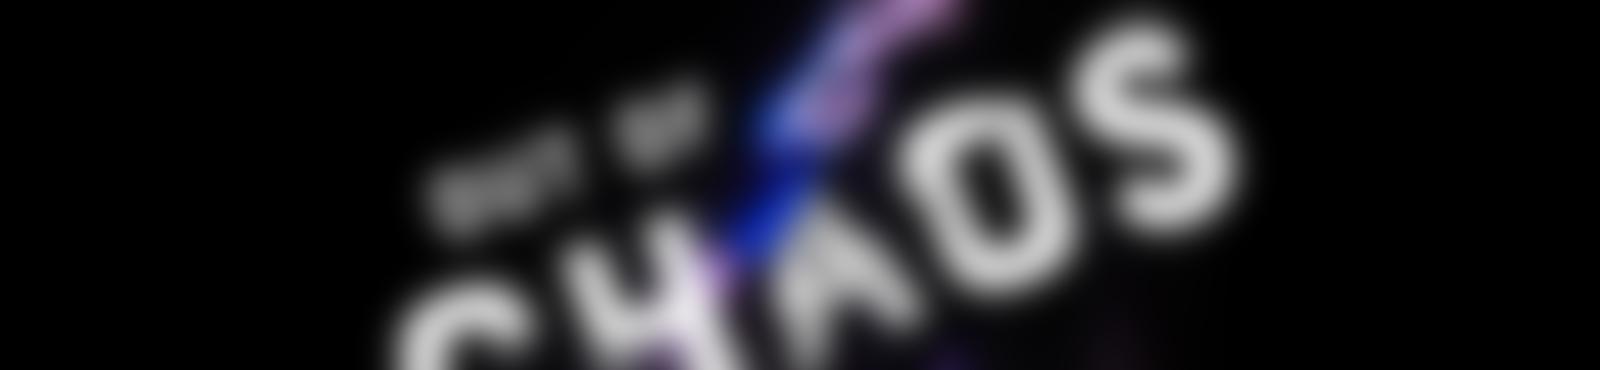 Blurred 110dd188 2490 4b37 bf03 eb74605d0665